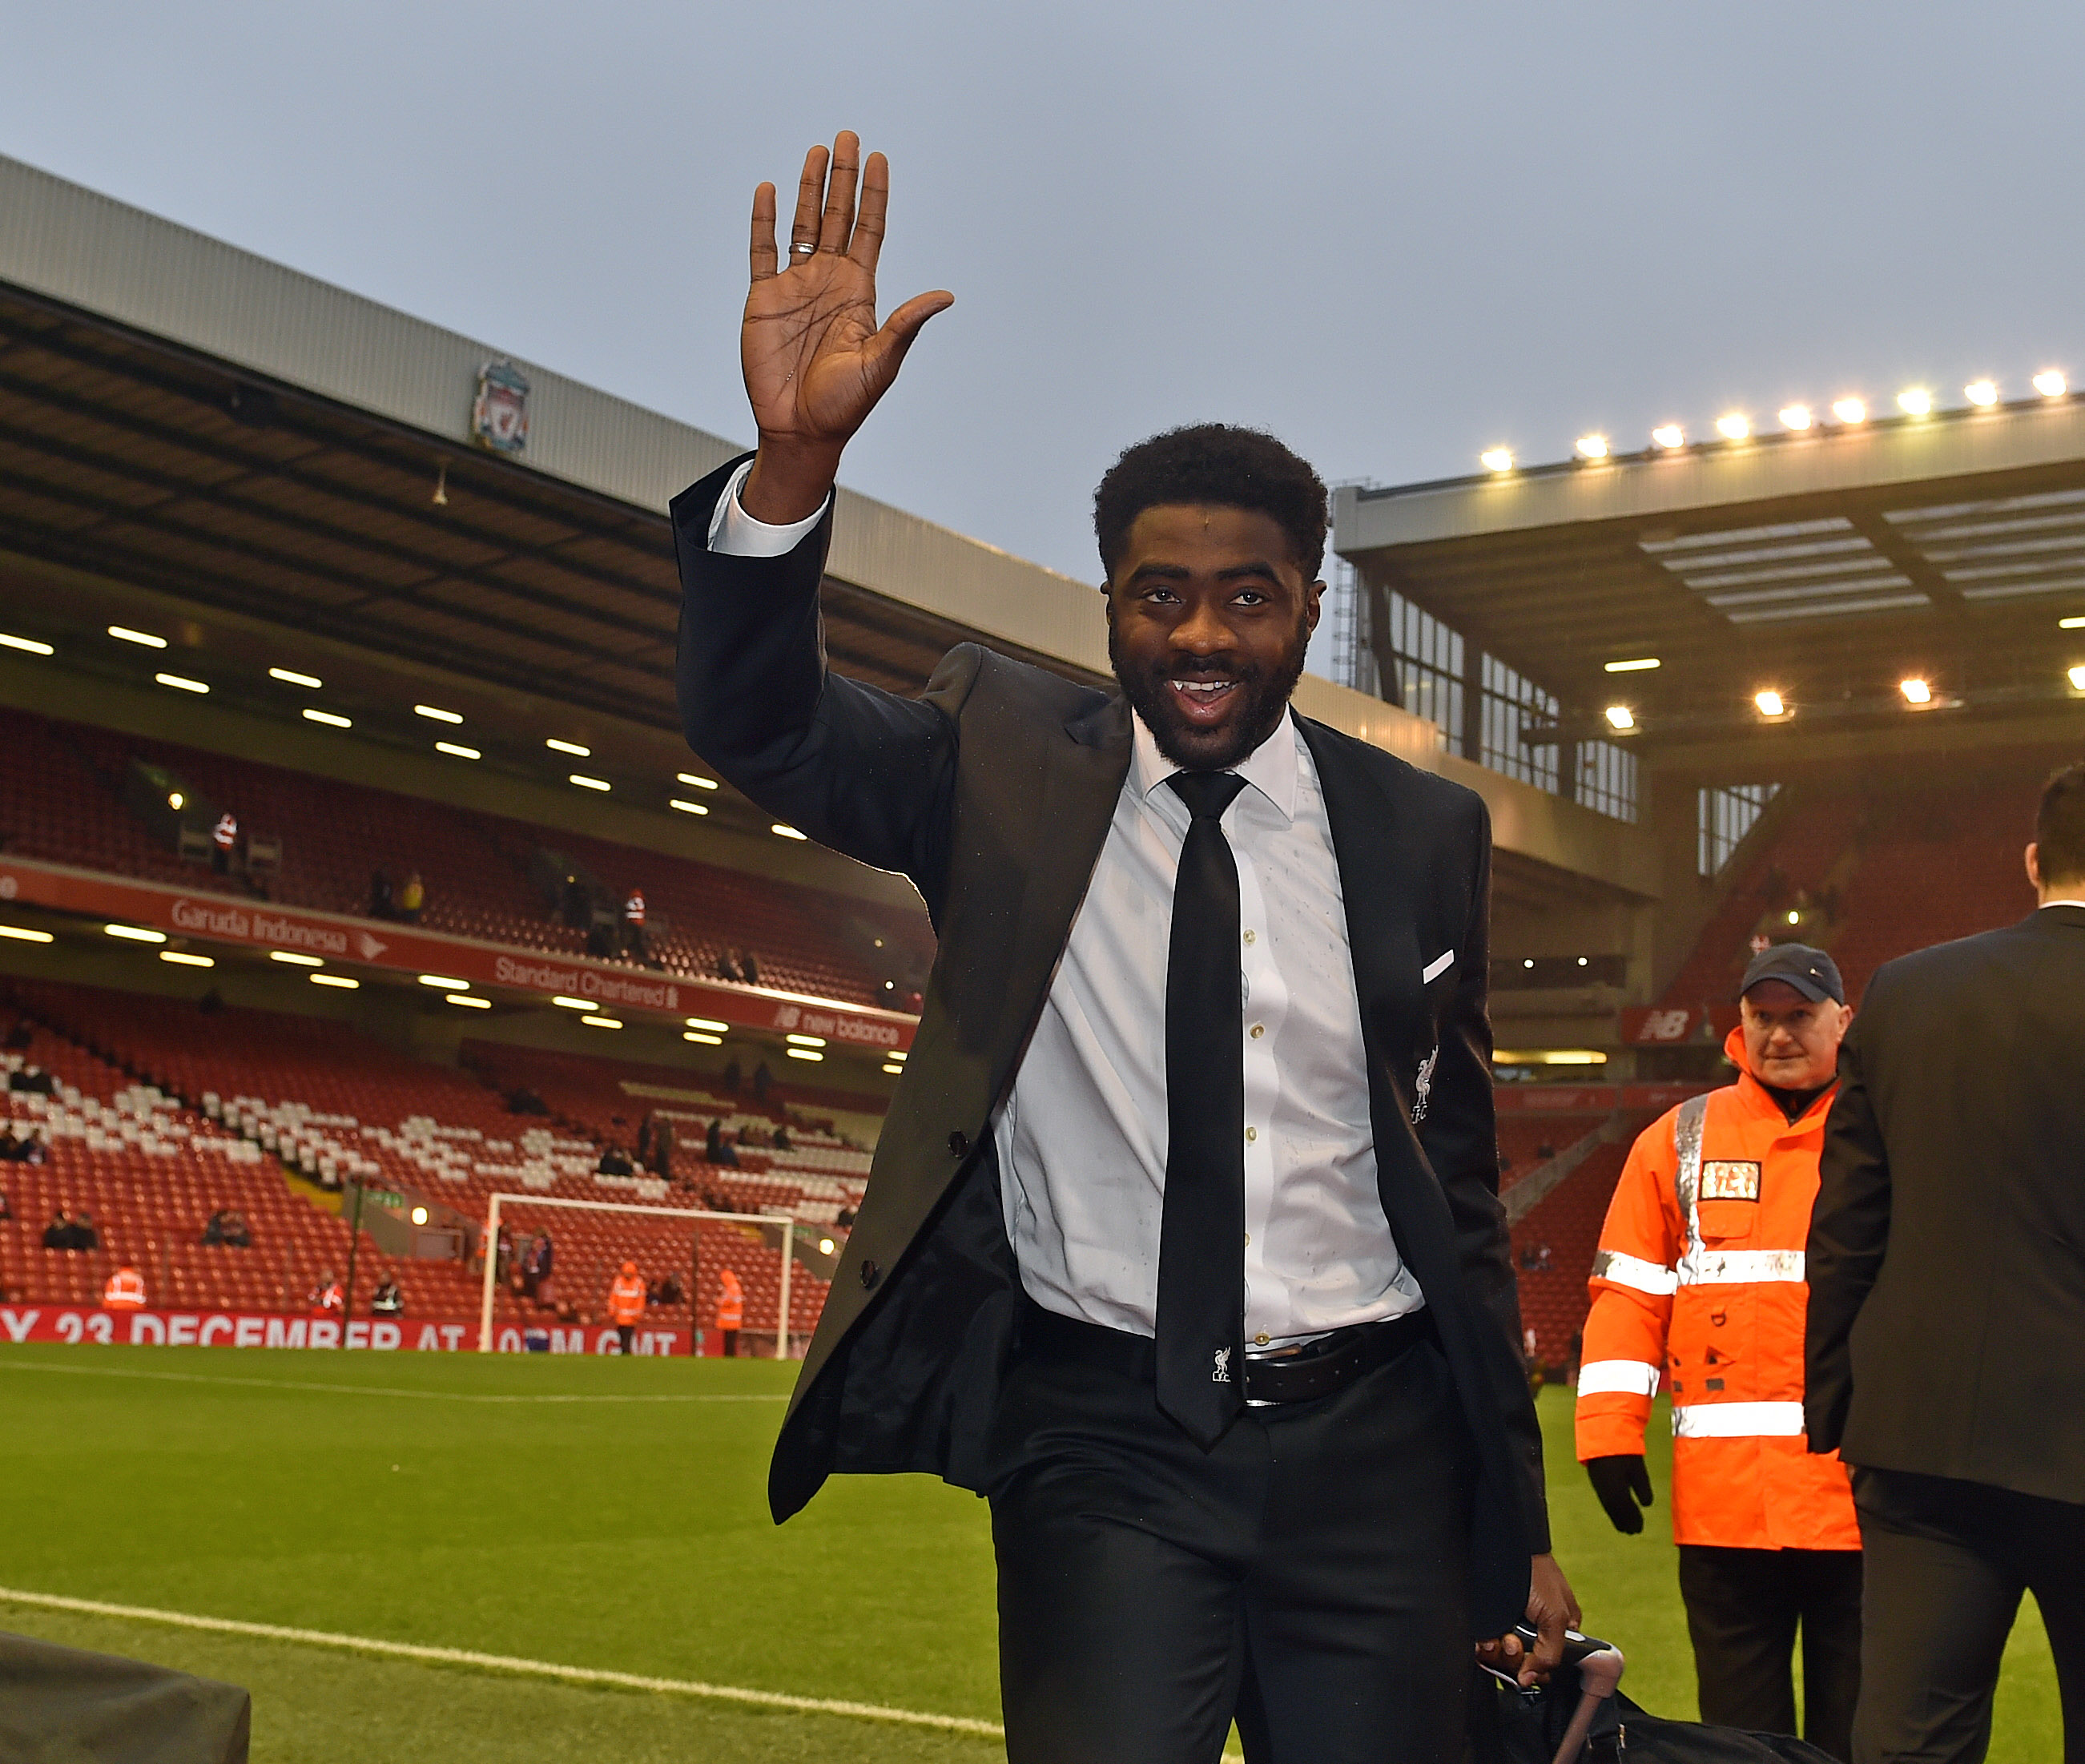 Liverpool can win the Europa League to save their season, says Kolo Toure